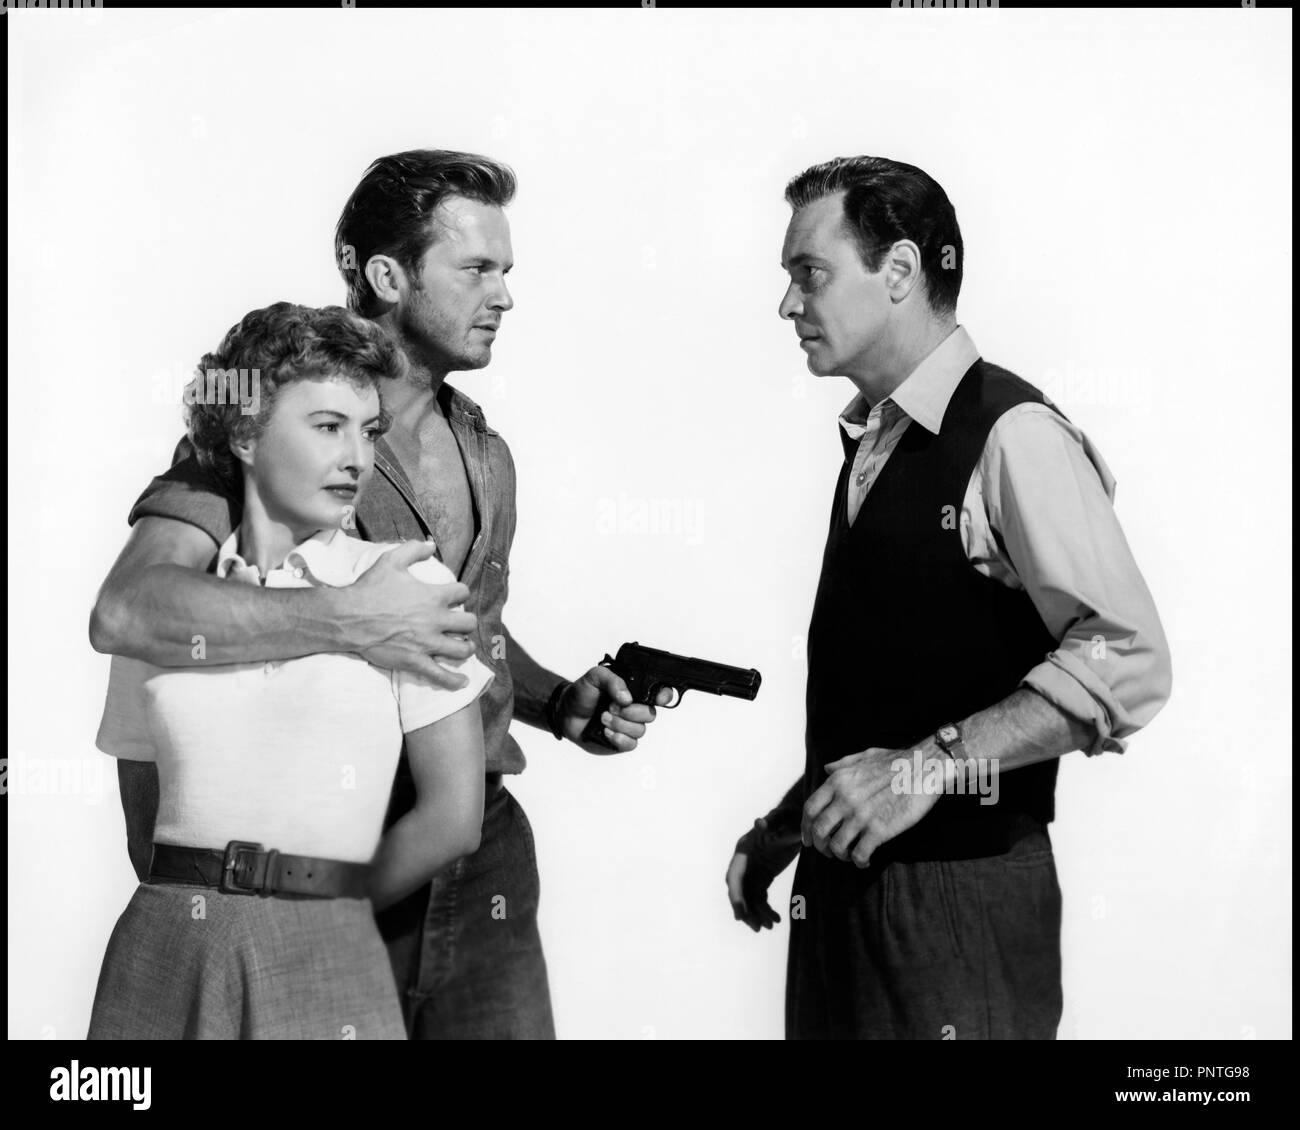 Prod DB © Loew's Inc. - Metro-Goldwyn-Mayer / DR LA PLAGE DESERTE (JEOPARDY) de John Sturges 1953 USA avec Barbara Stanwyck, Ralph Meeker et Barry Sullivan enlevement, kidnapping, menacer, pistolet automatique, film noir code MGM: 1594 - Stock Image